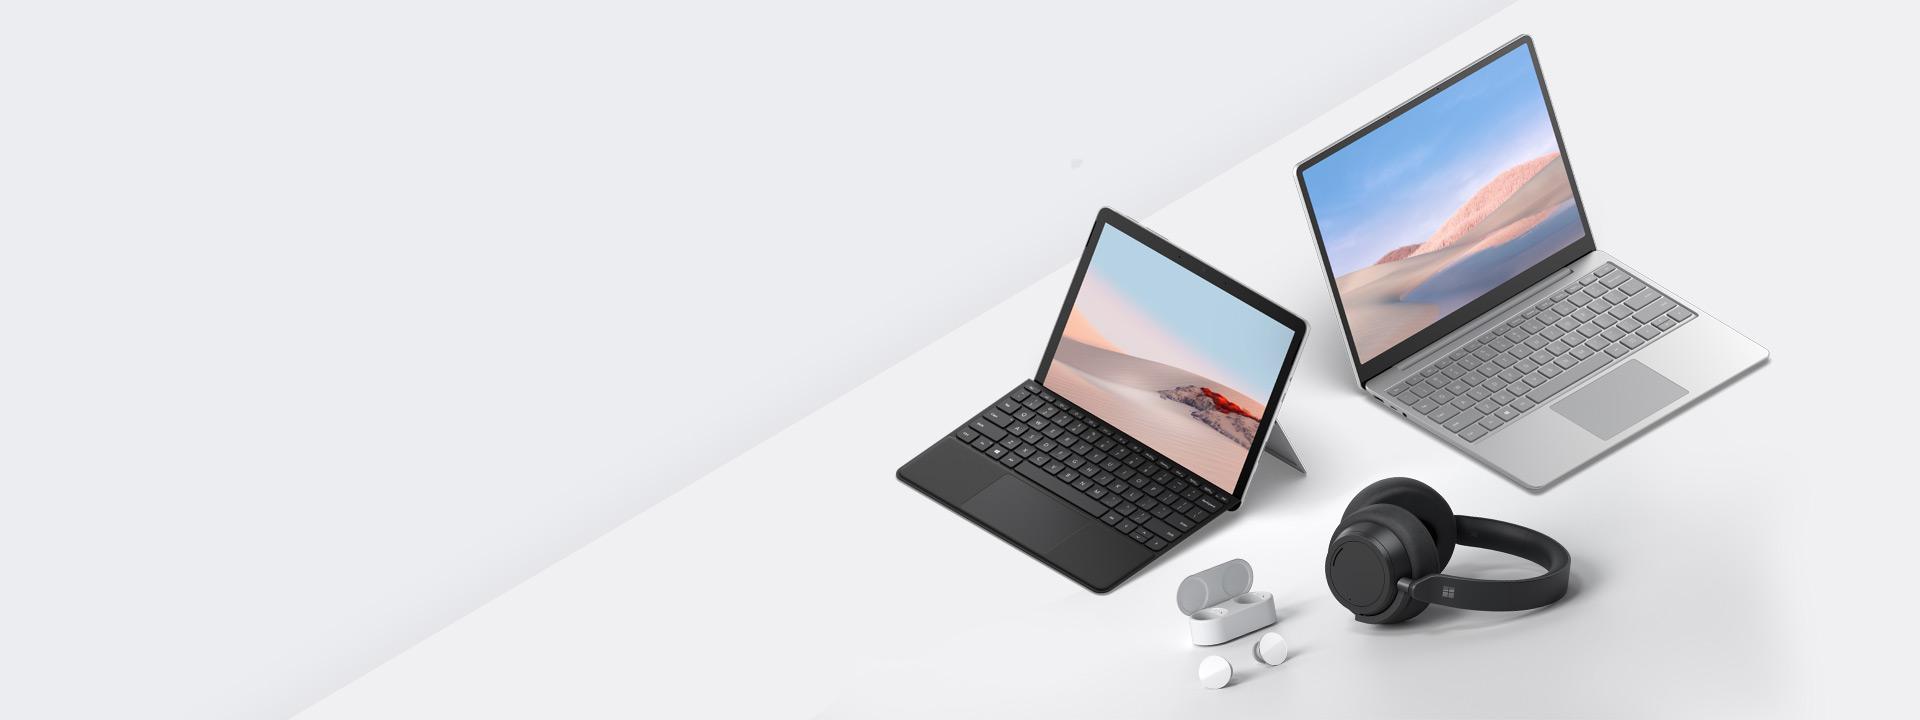 Bilde viser Surface Laptop Go og Surface Go 2 med ørepropper og hodetelefoner